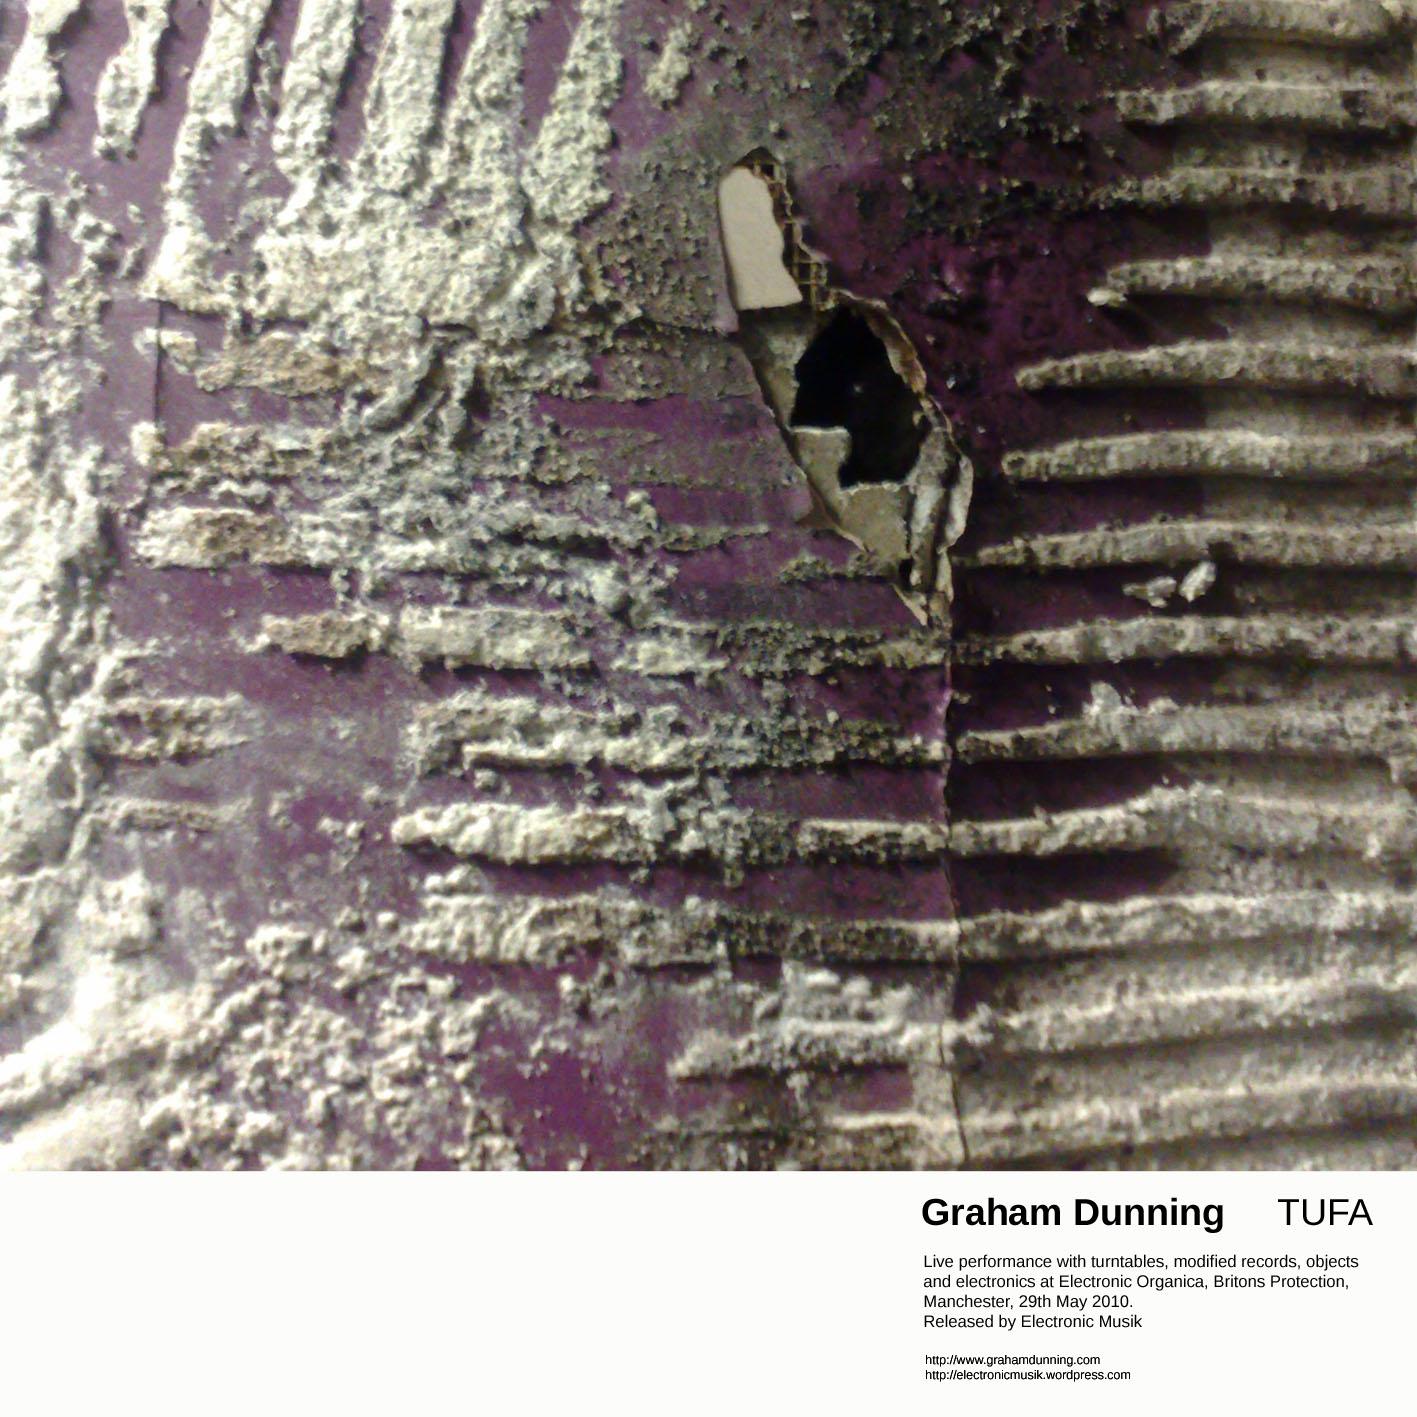 Graham Dunning - TUFA - Electronic Musik